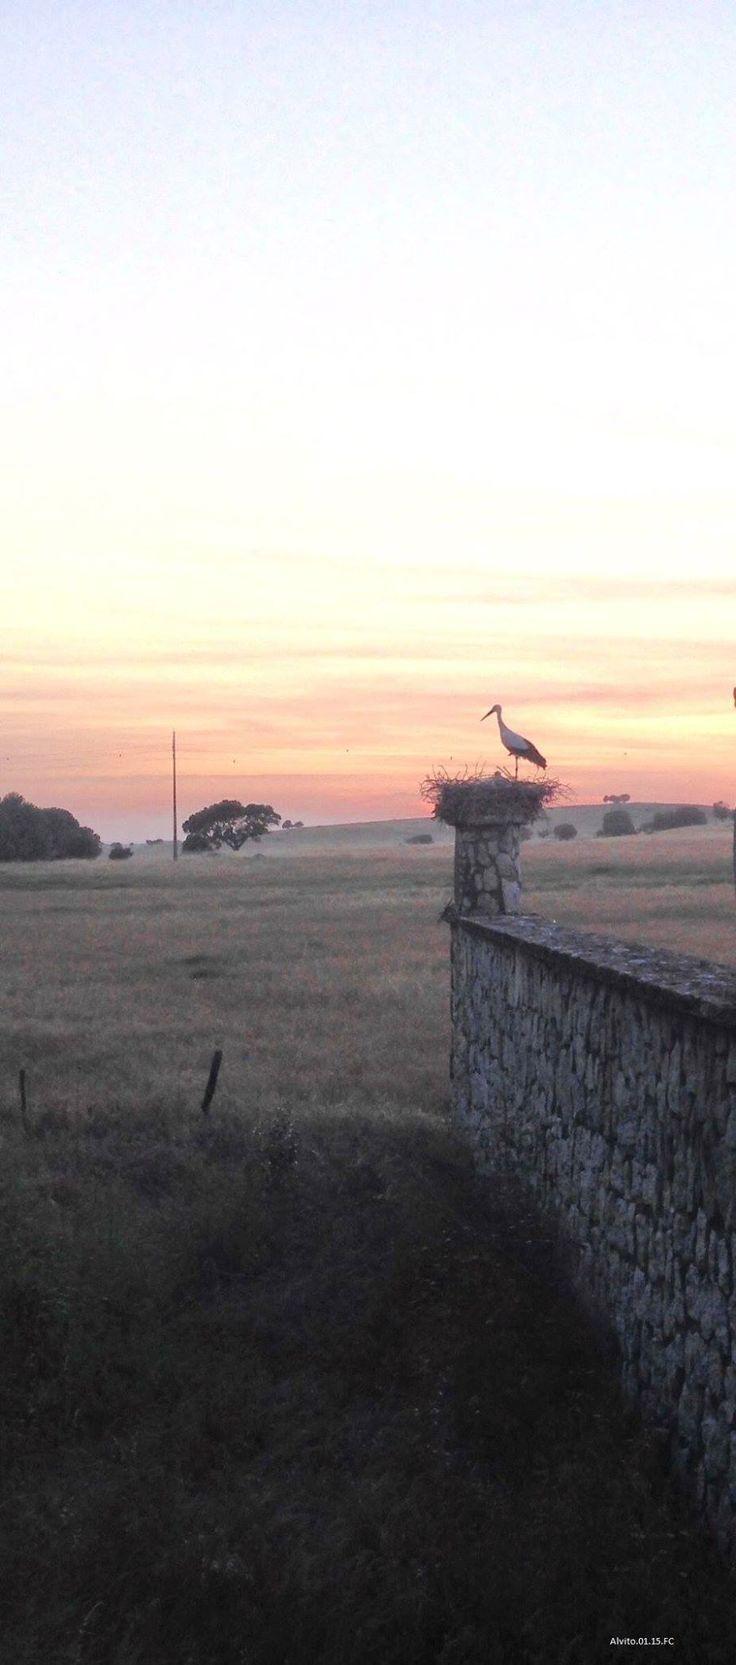 Unbelievable View | Pestana Pousada do Crato | Portugal | Paradisiac Places